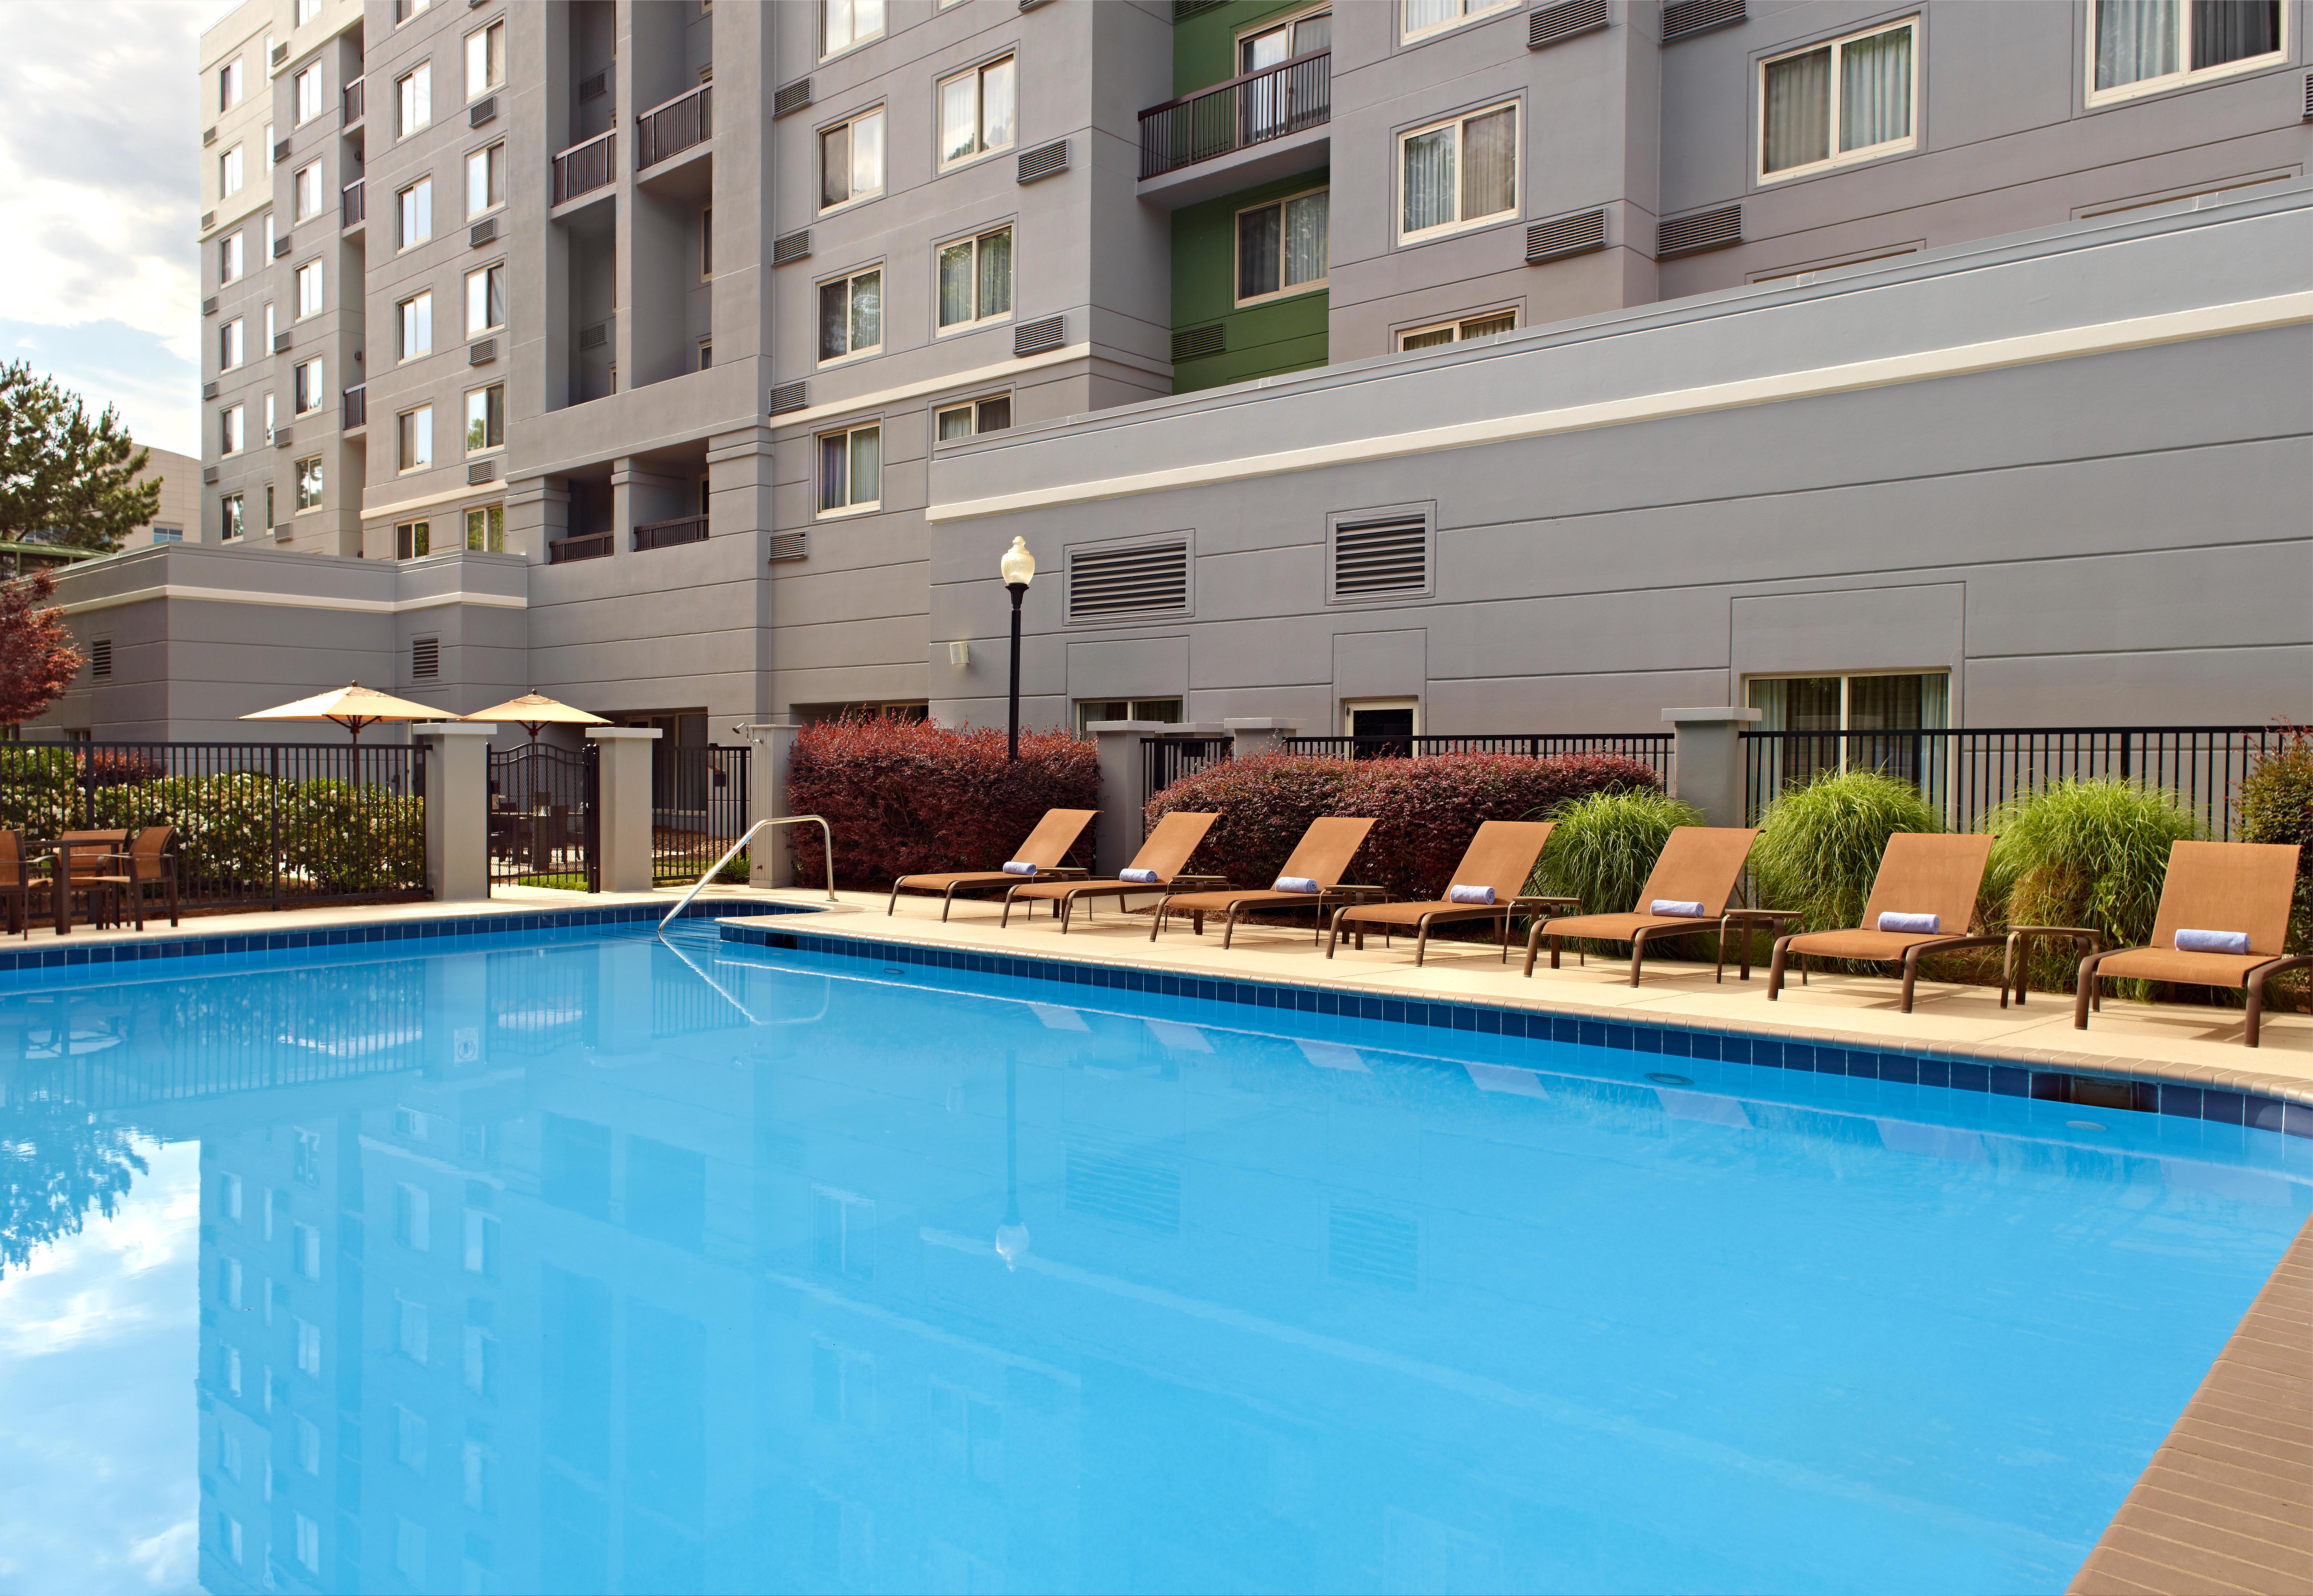 Courtyard by Marriott Atlanta Midtown/Georgia Tech image 1